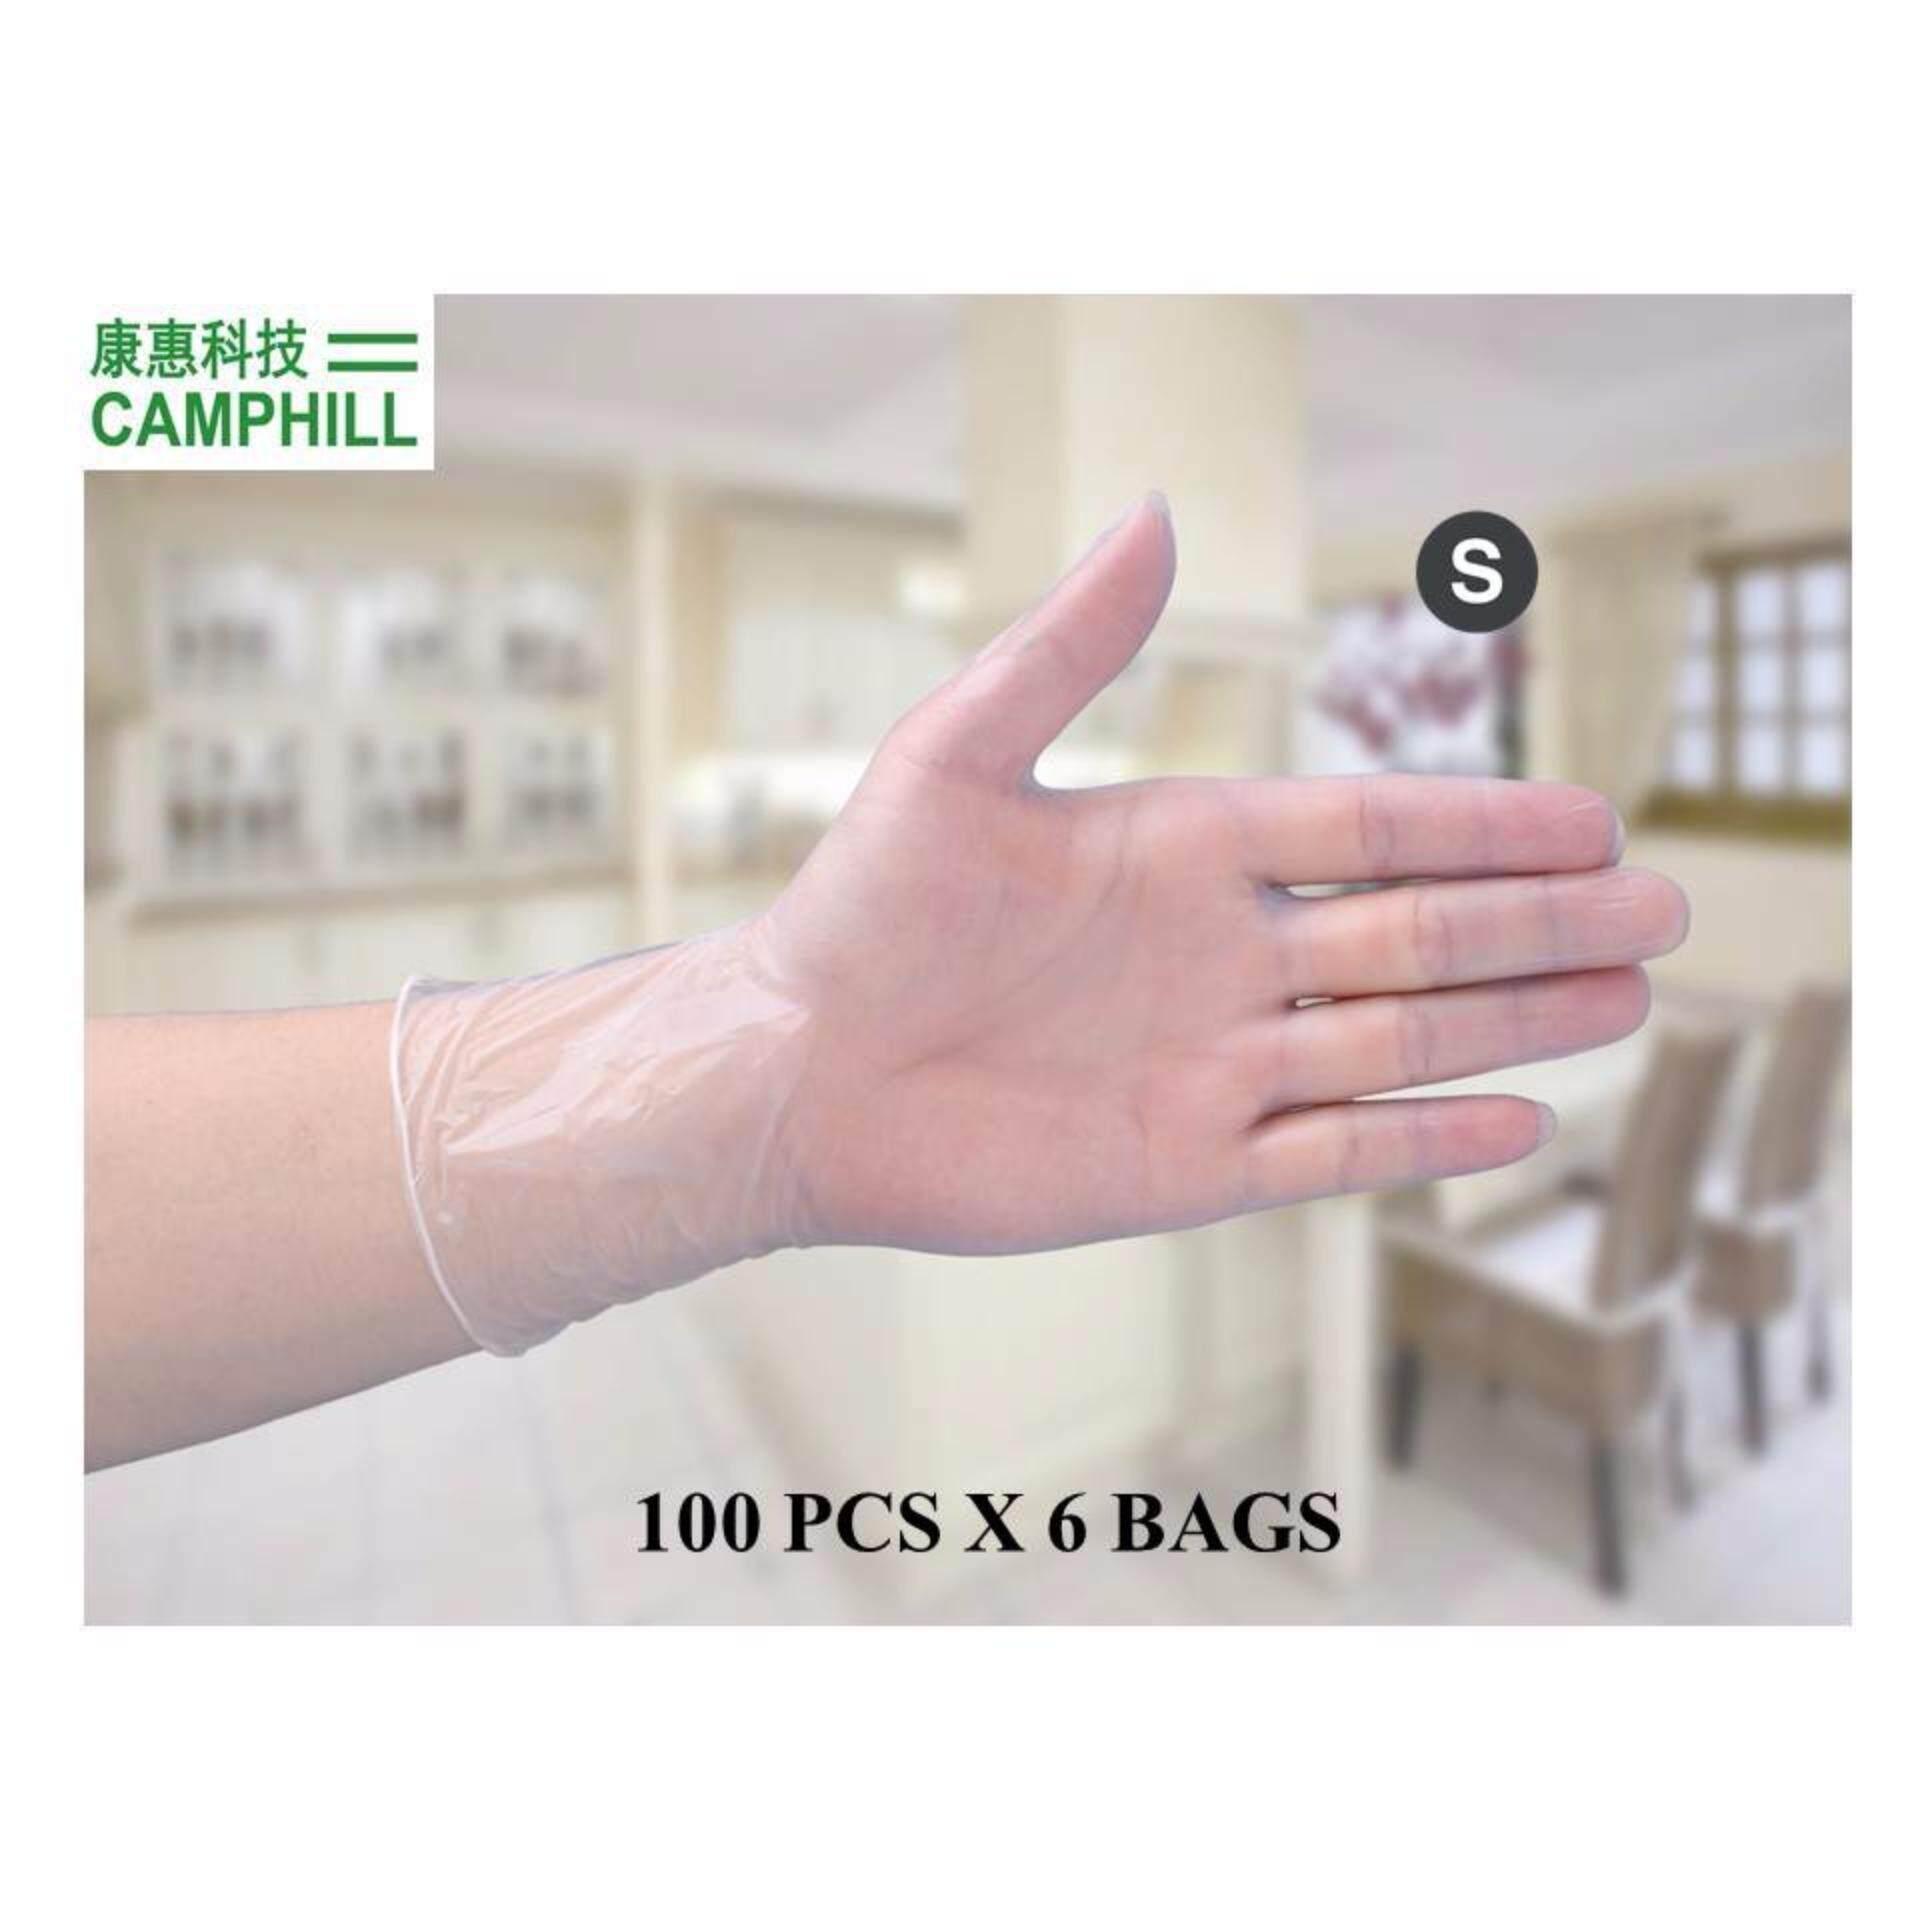 Buy Disposable Camclean Vinyl Pvc Powder Free Medical Use Sarung Tangan Nitrile Examination Gloves Non Sterile Food Handling Glove S